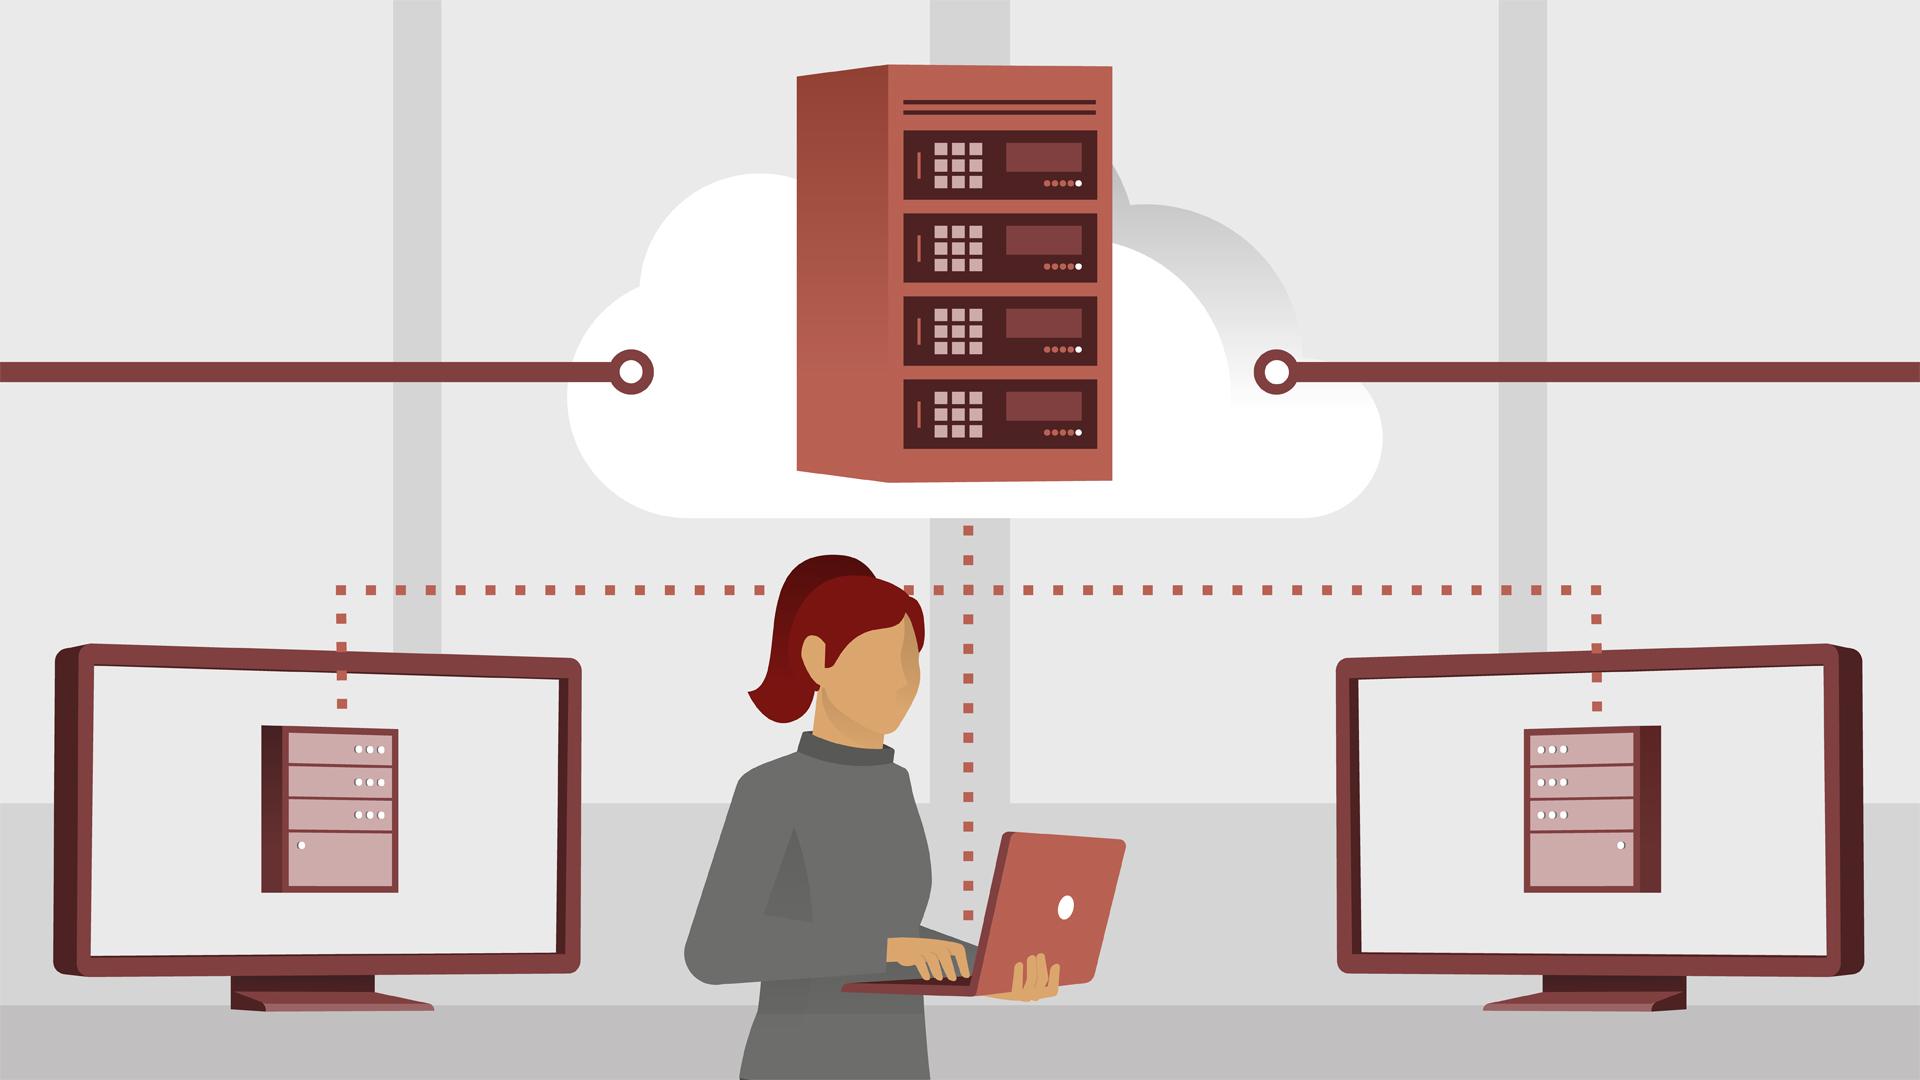 CompTIA Network+ (N10-007) Cert Prep: 6 Advanced IP Networking